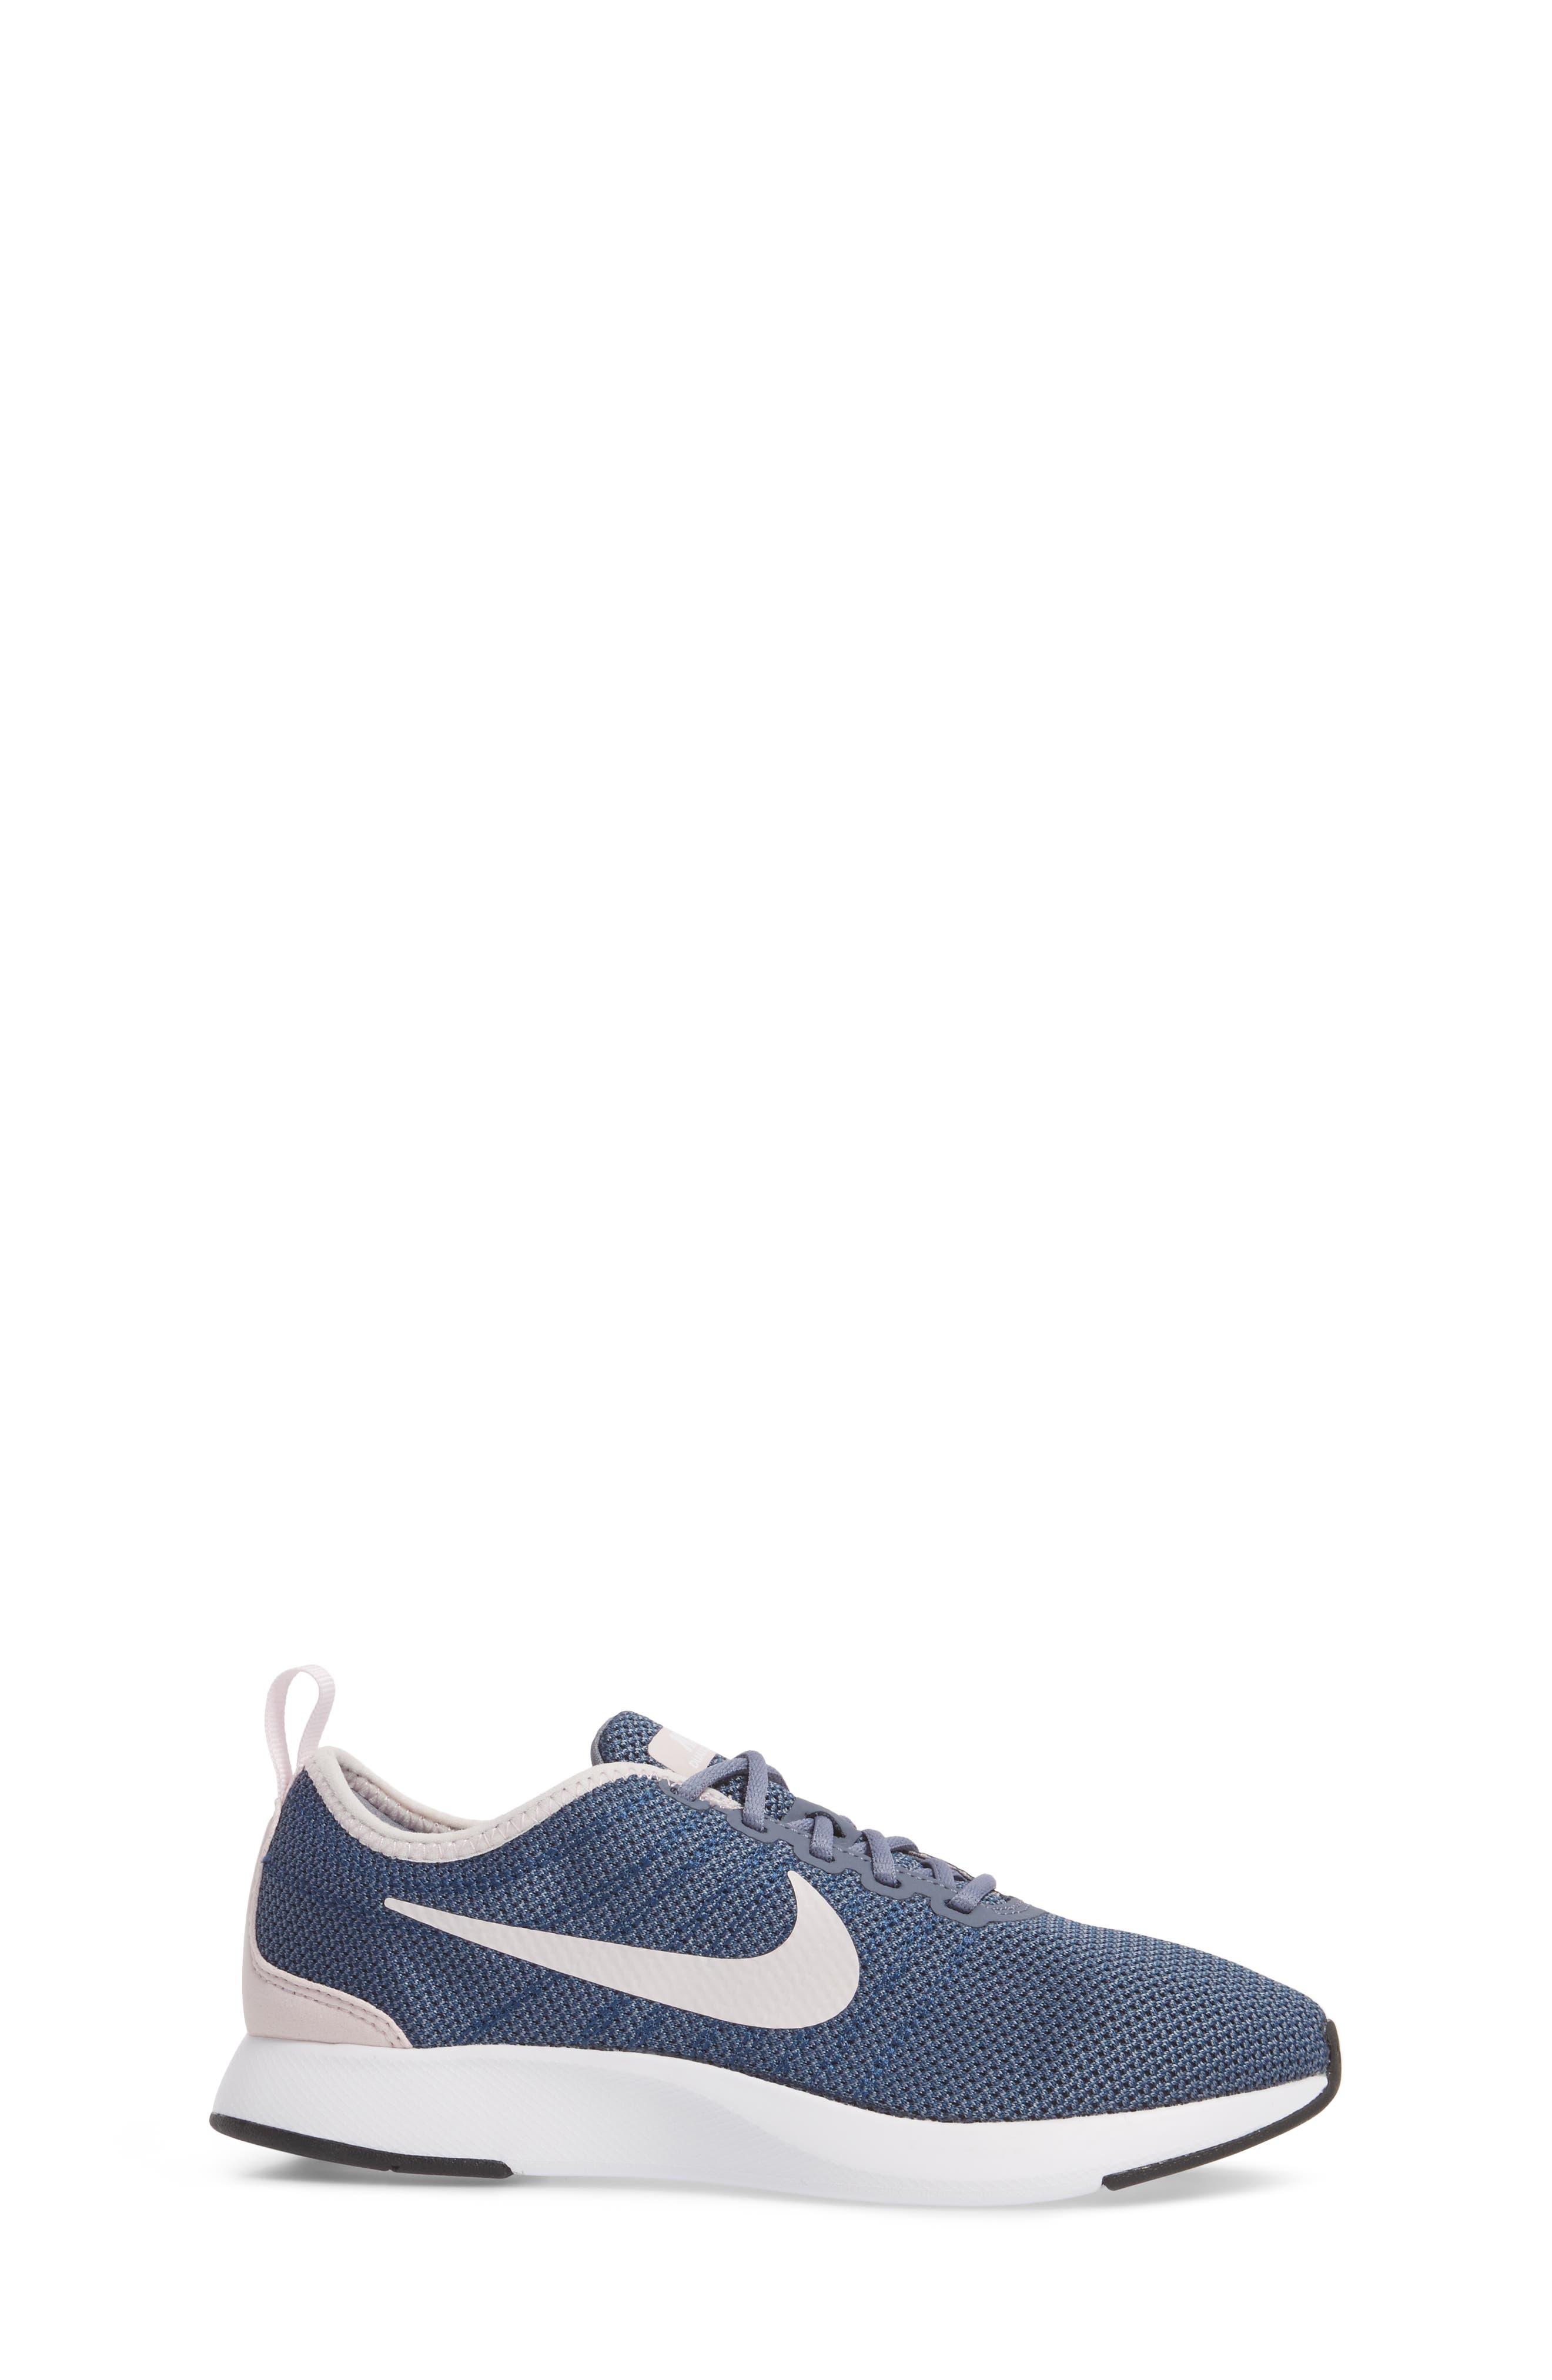 Dualtone Racer GS Sneaker,                             Alternate thumbnail 3, color,                             020